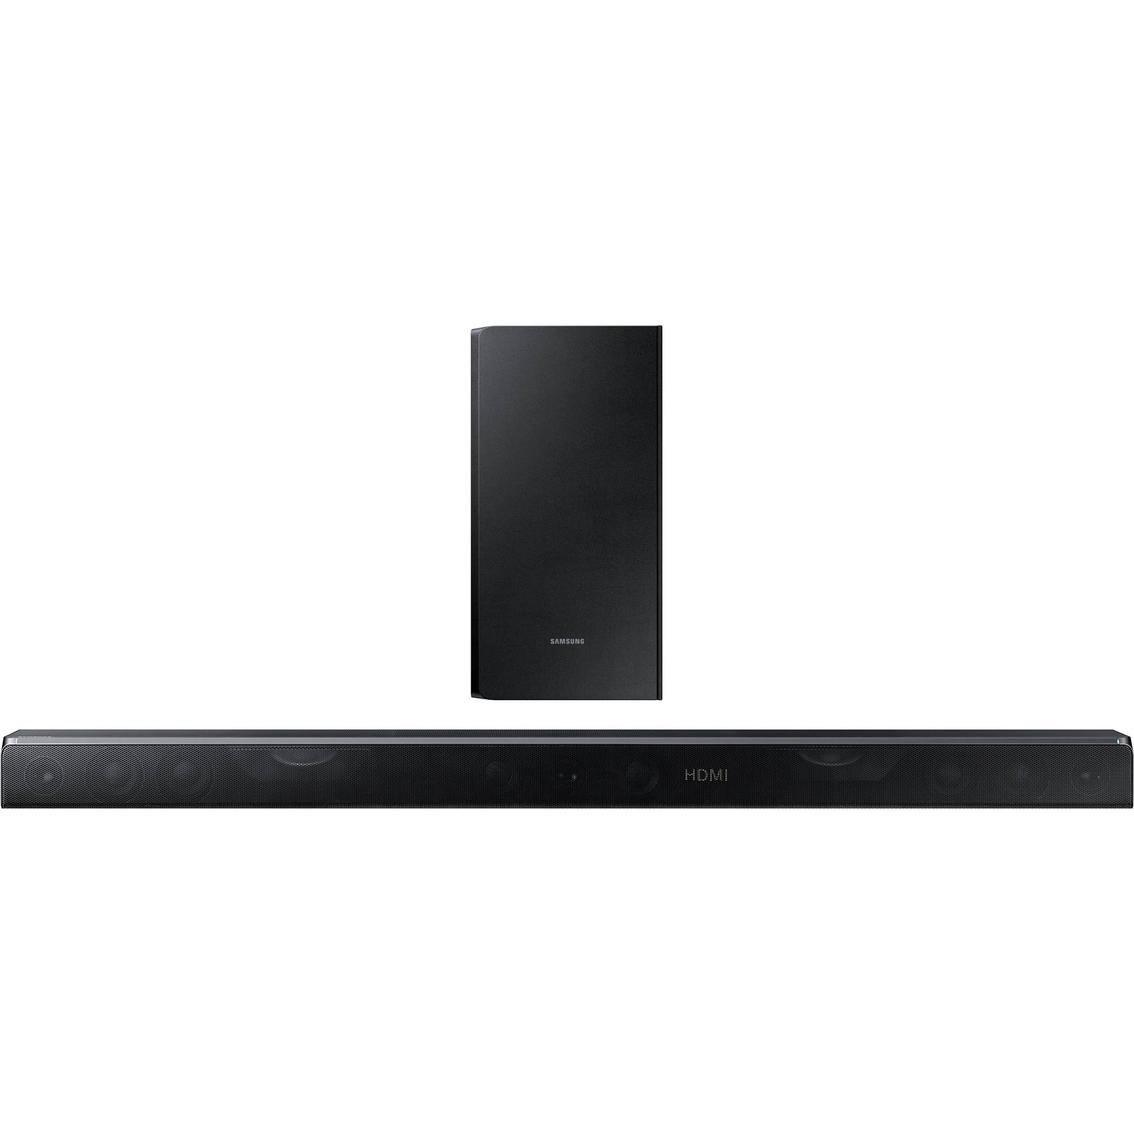 Samsung Hw-k850 Soundbar With Dolby Atmos   Sound Bars